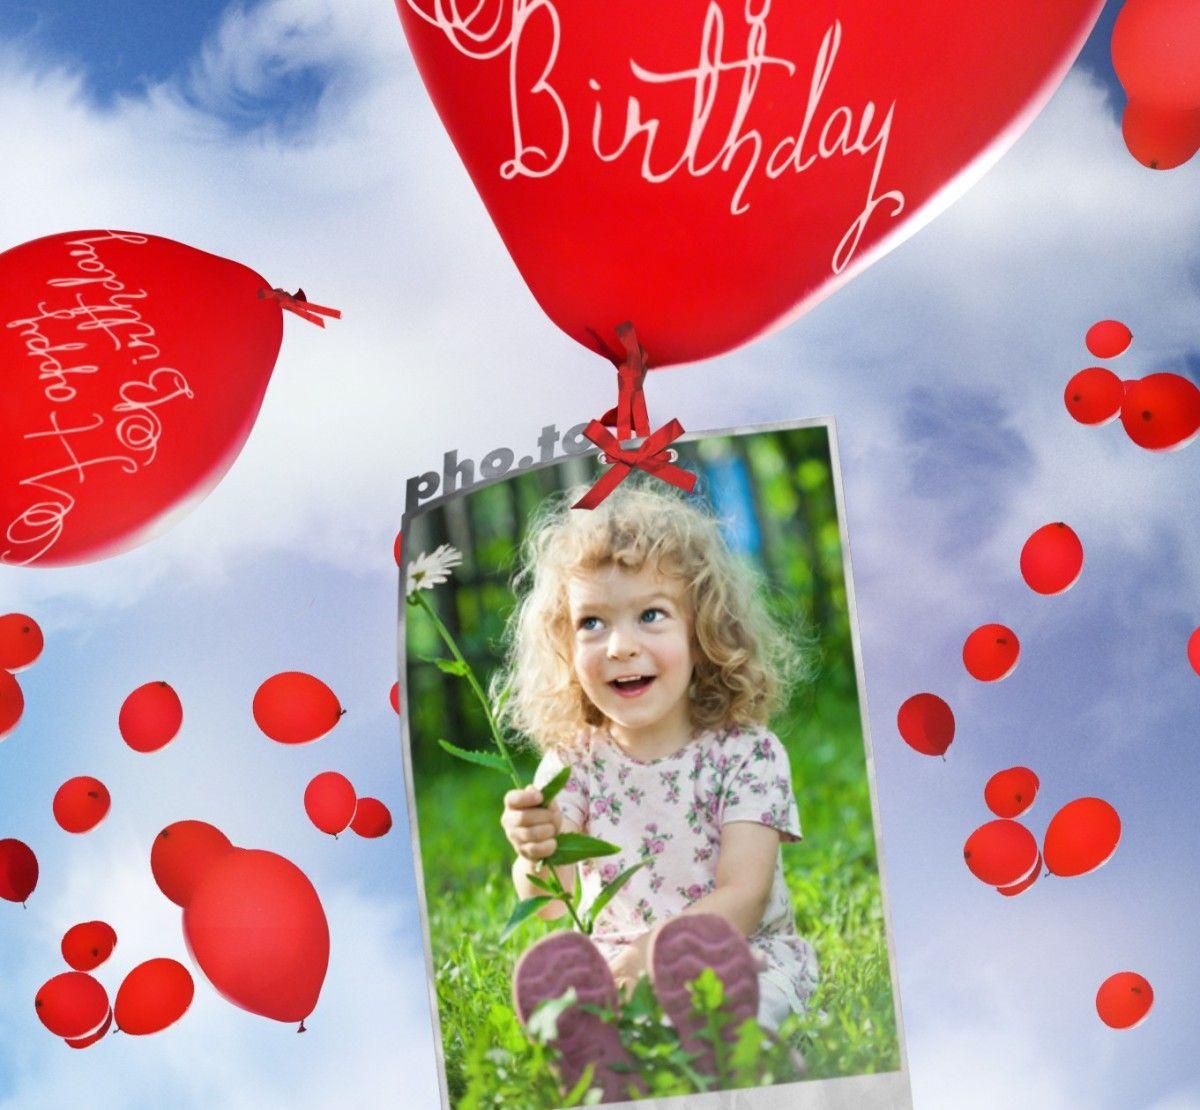 10 Top Birthday Card Create Online In 2021 Birthday Card With Photo Birthday Card Online Birthday Card Maker